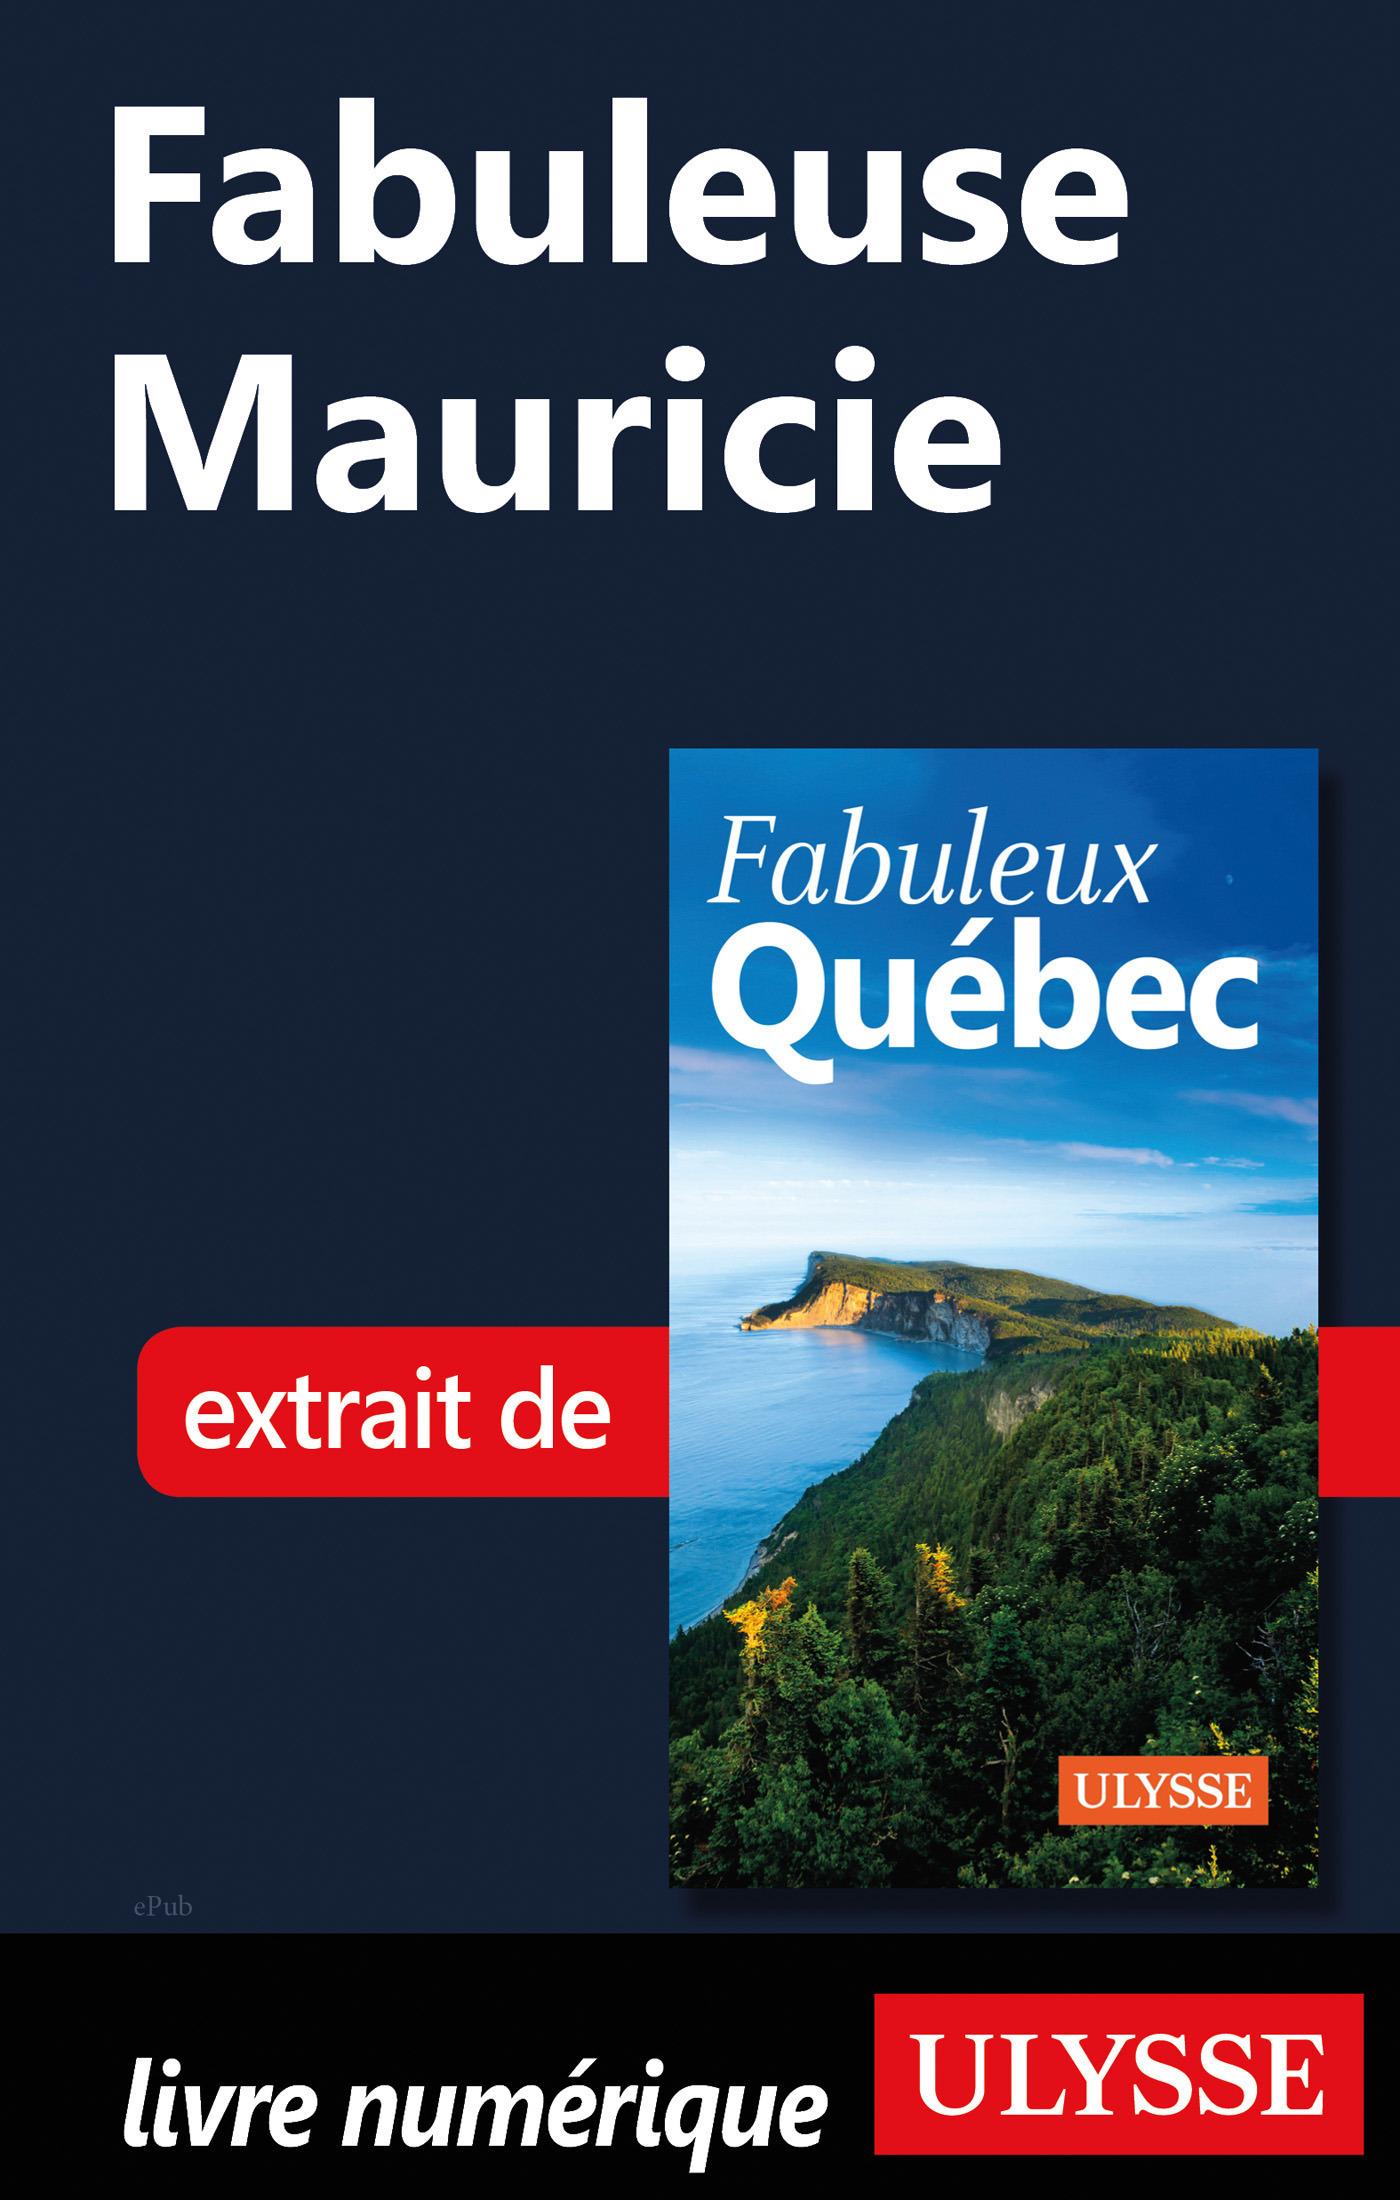 Fabuleuse Mauricie